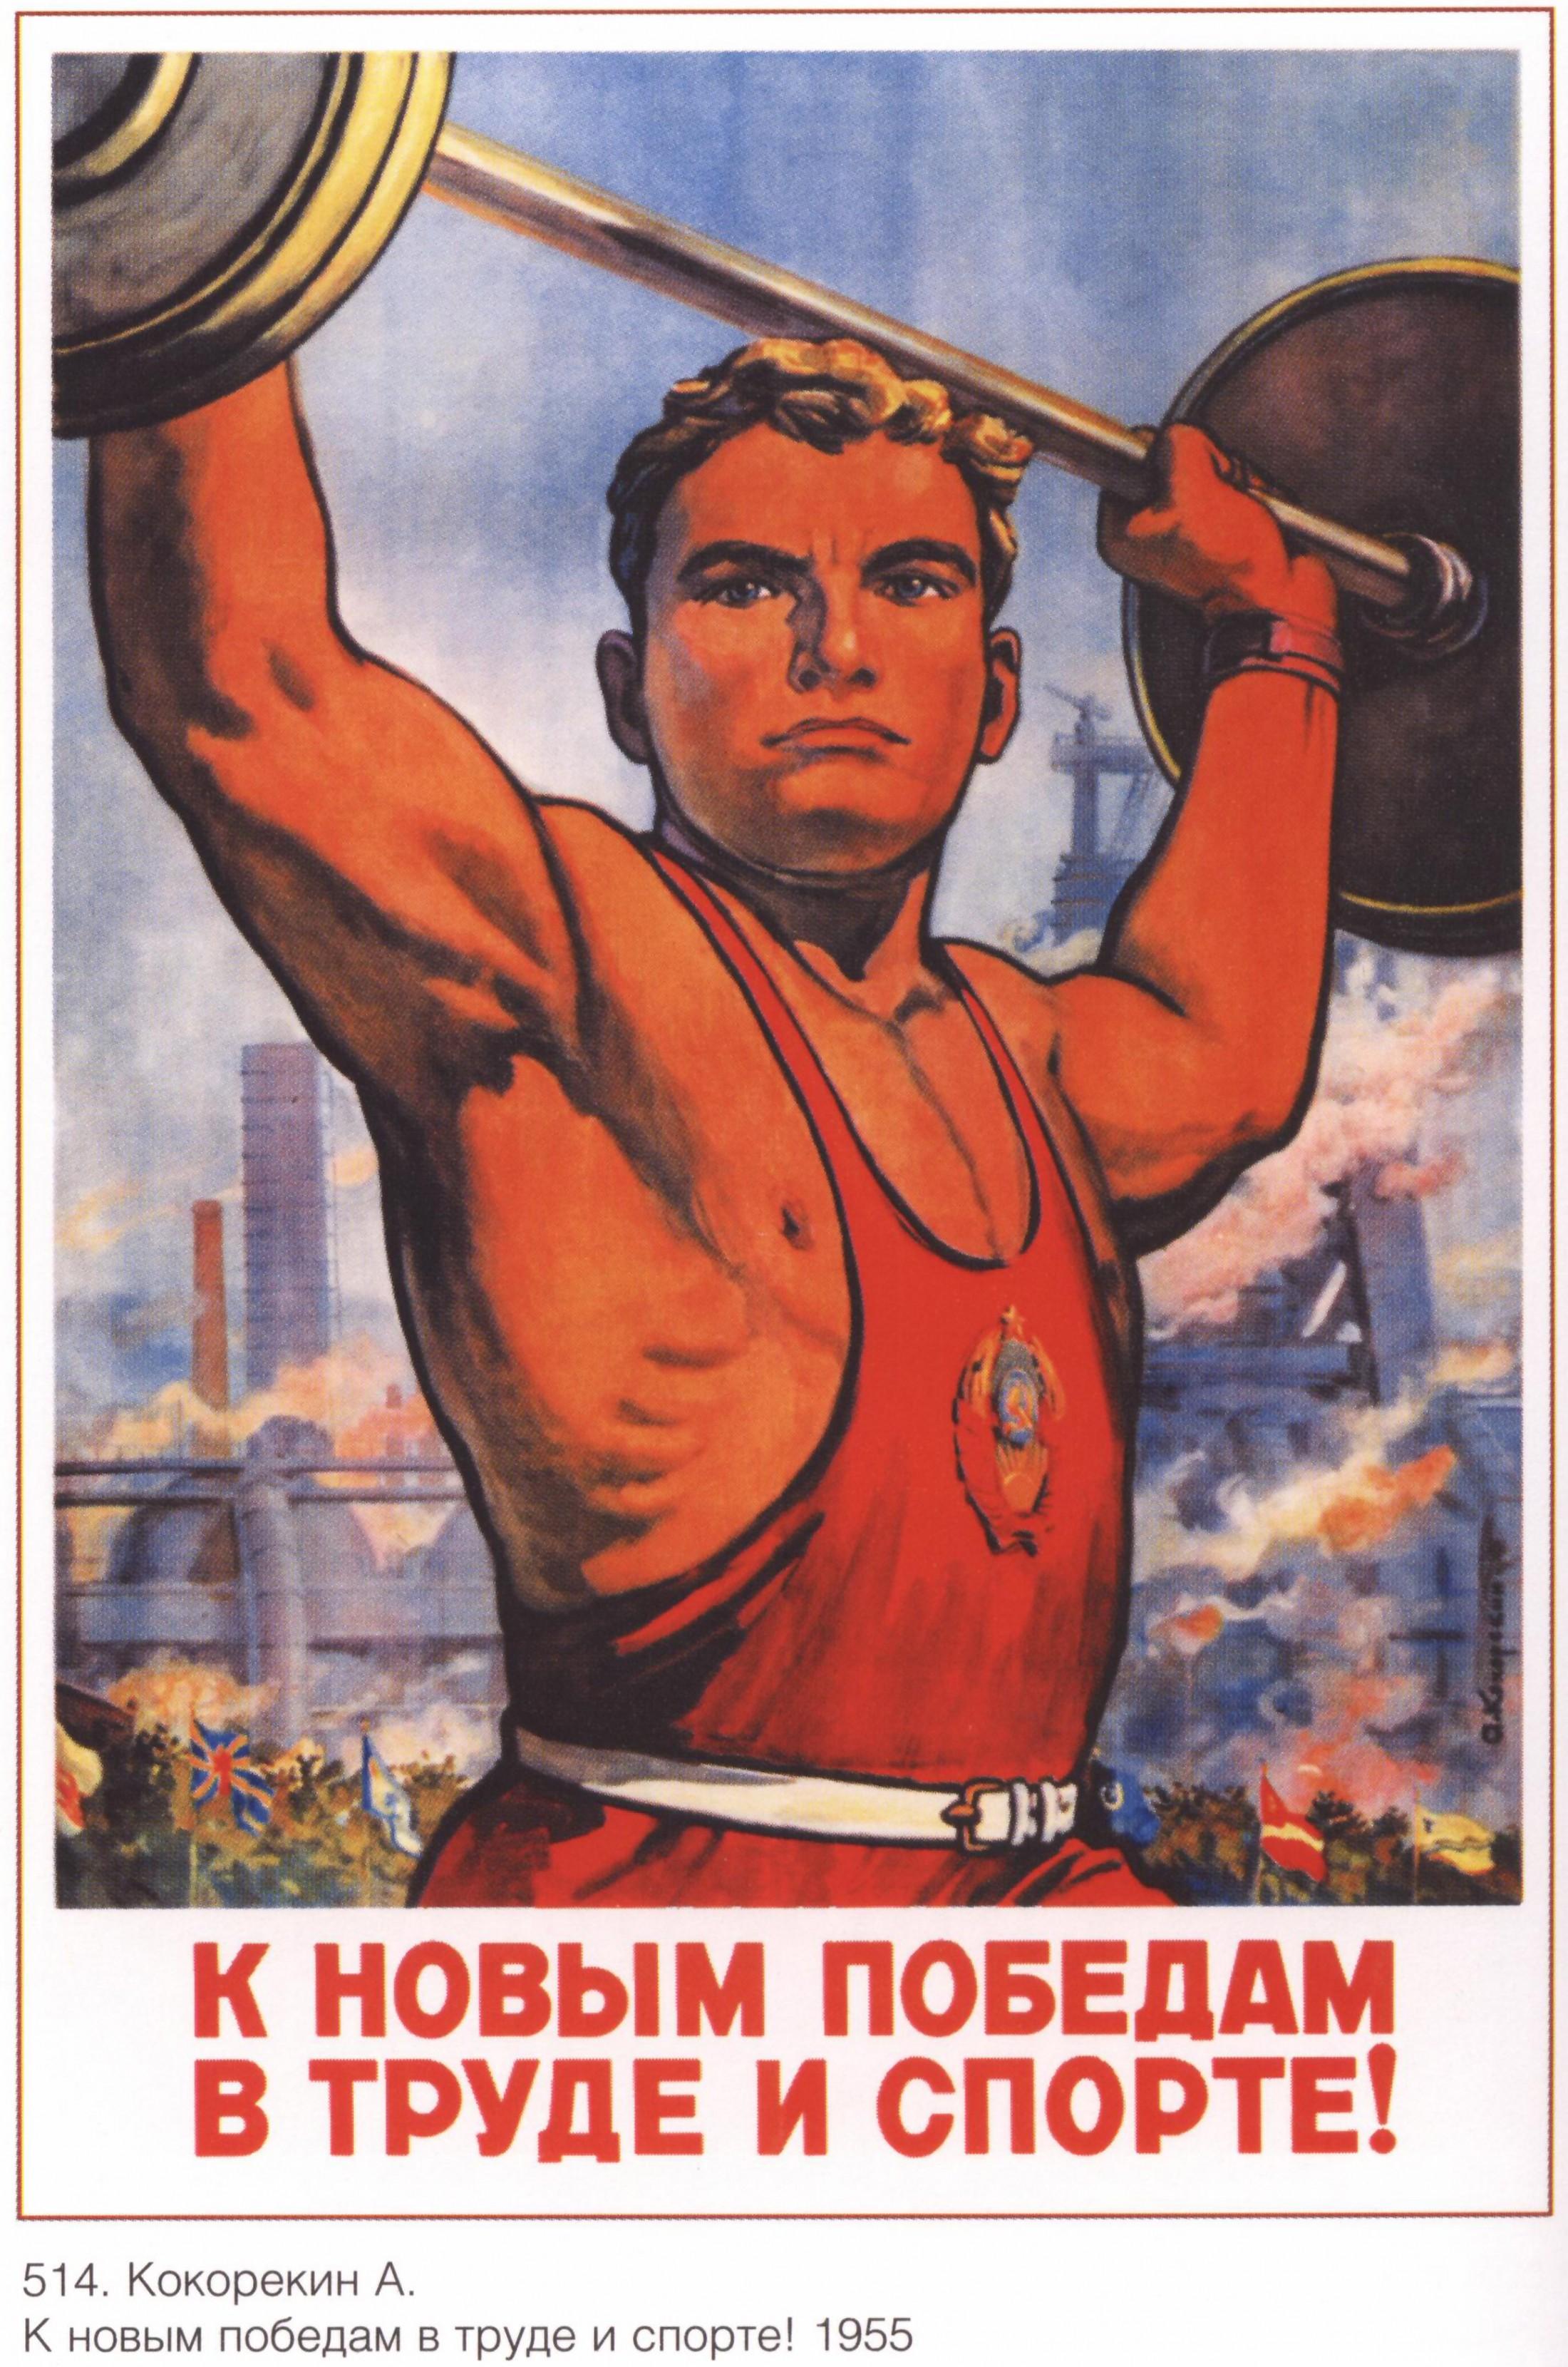 Пожелания, спорт картинки открытки